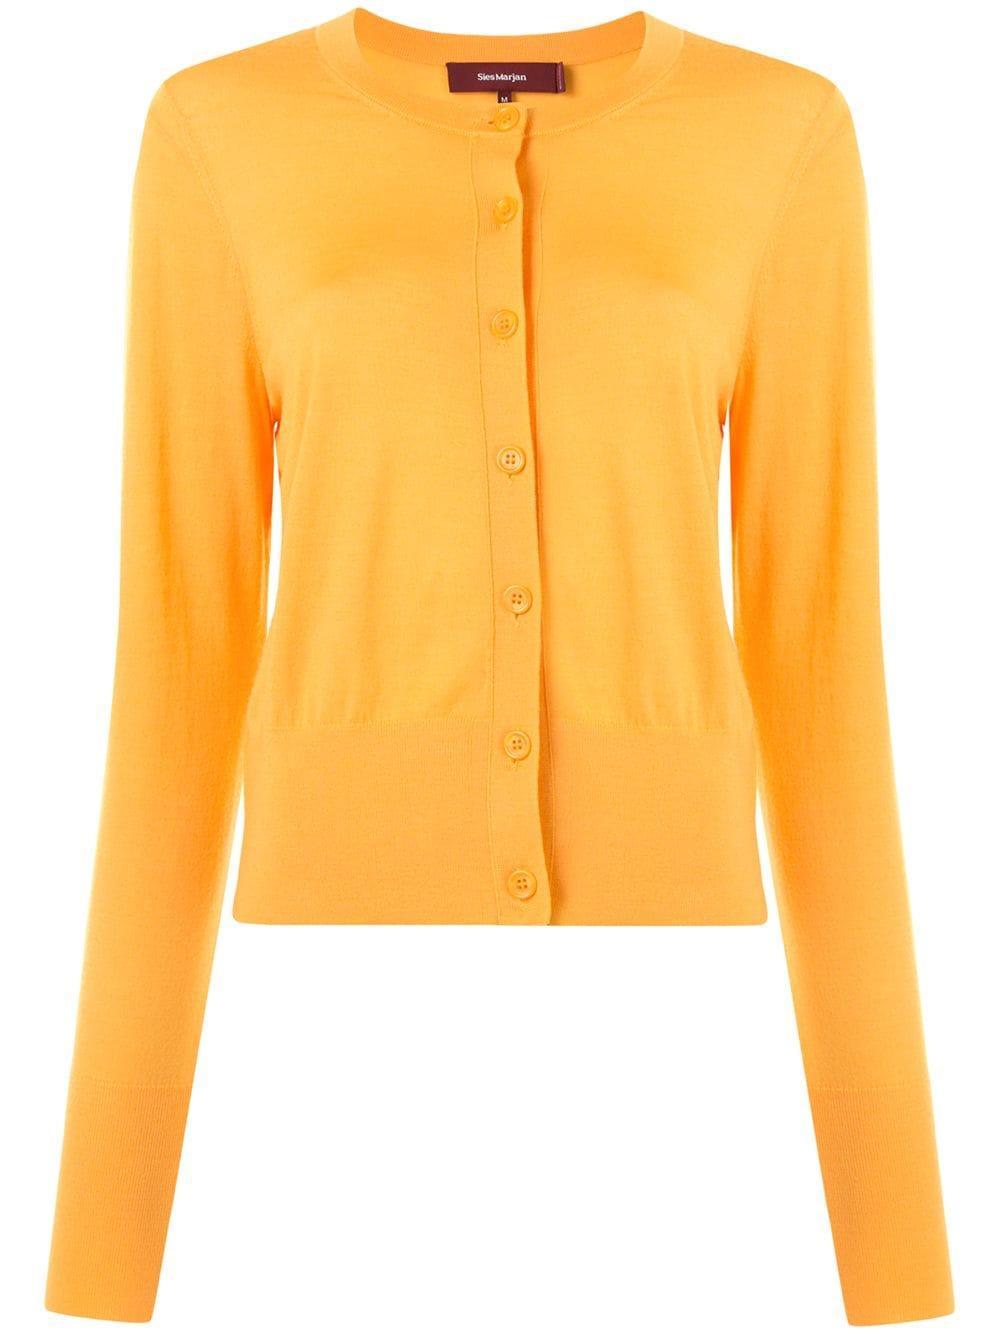 Tahira Superfine Merino Cropped Cardigan Item # 16FE8096-SLOWOOL